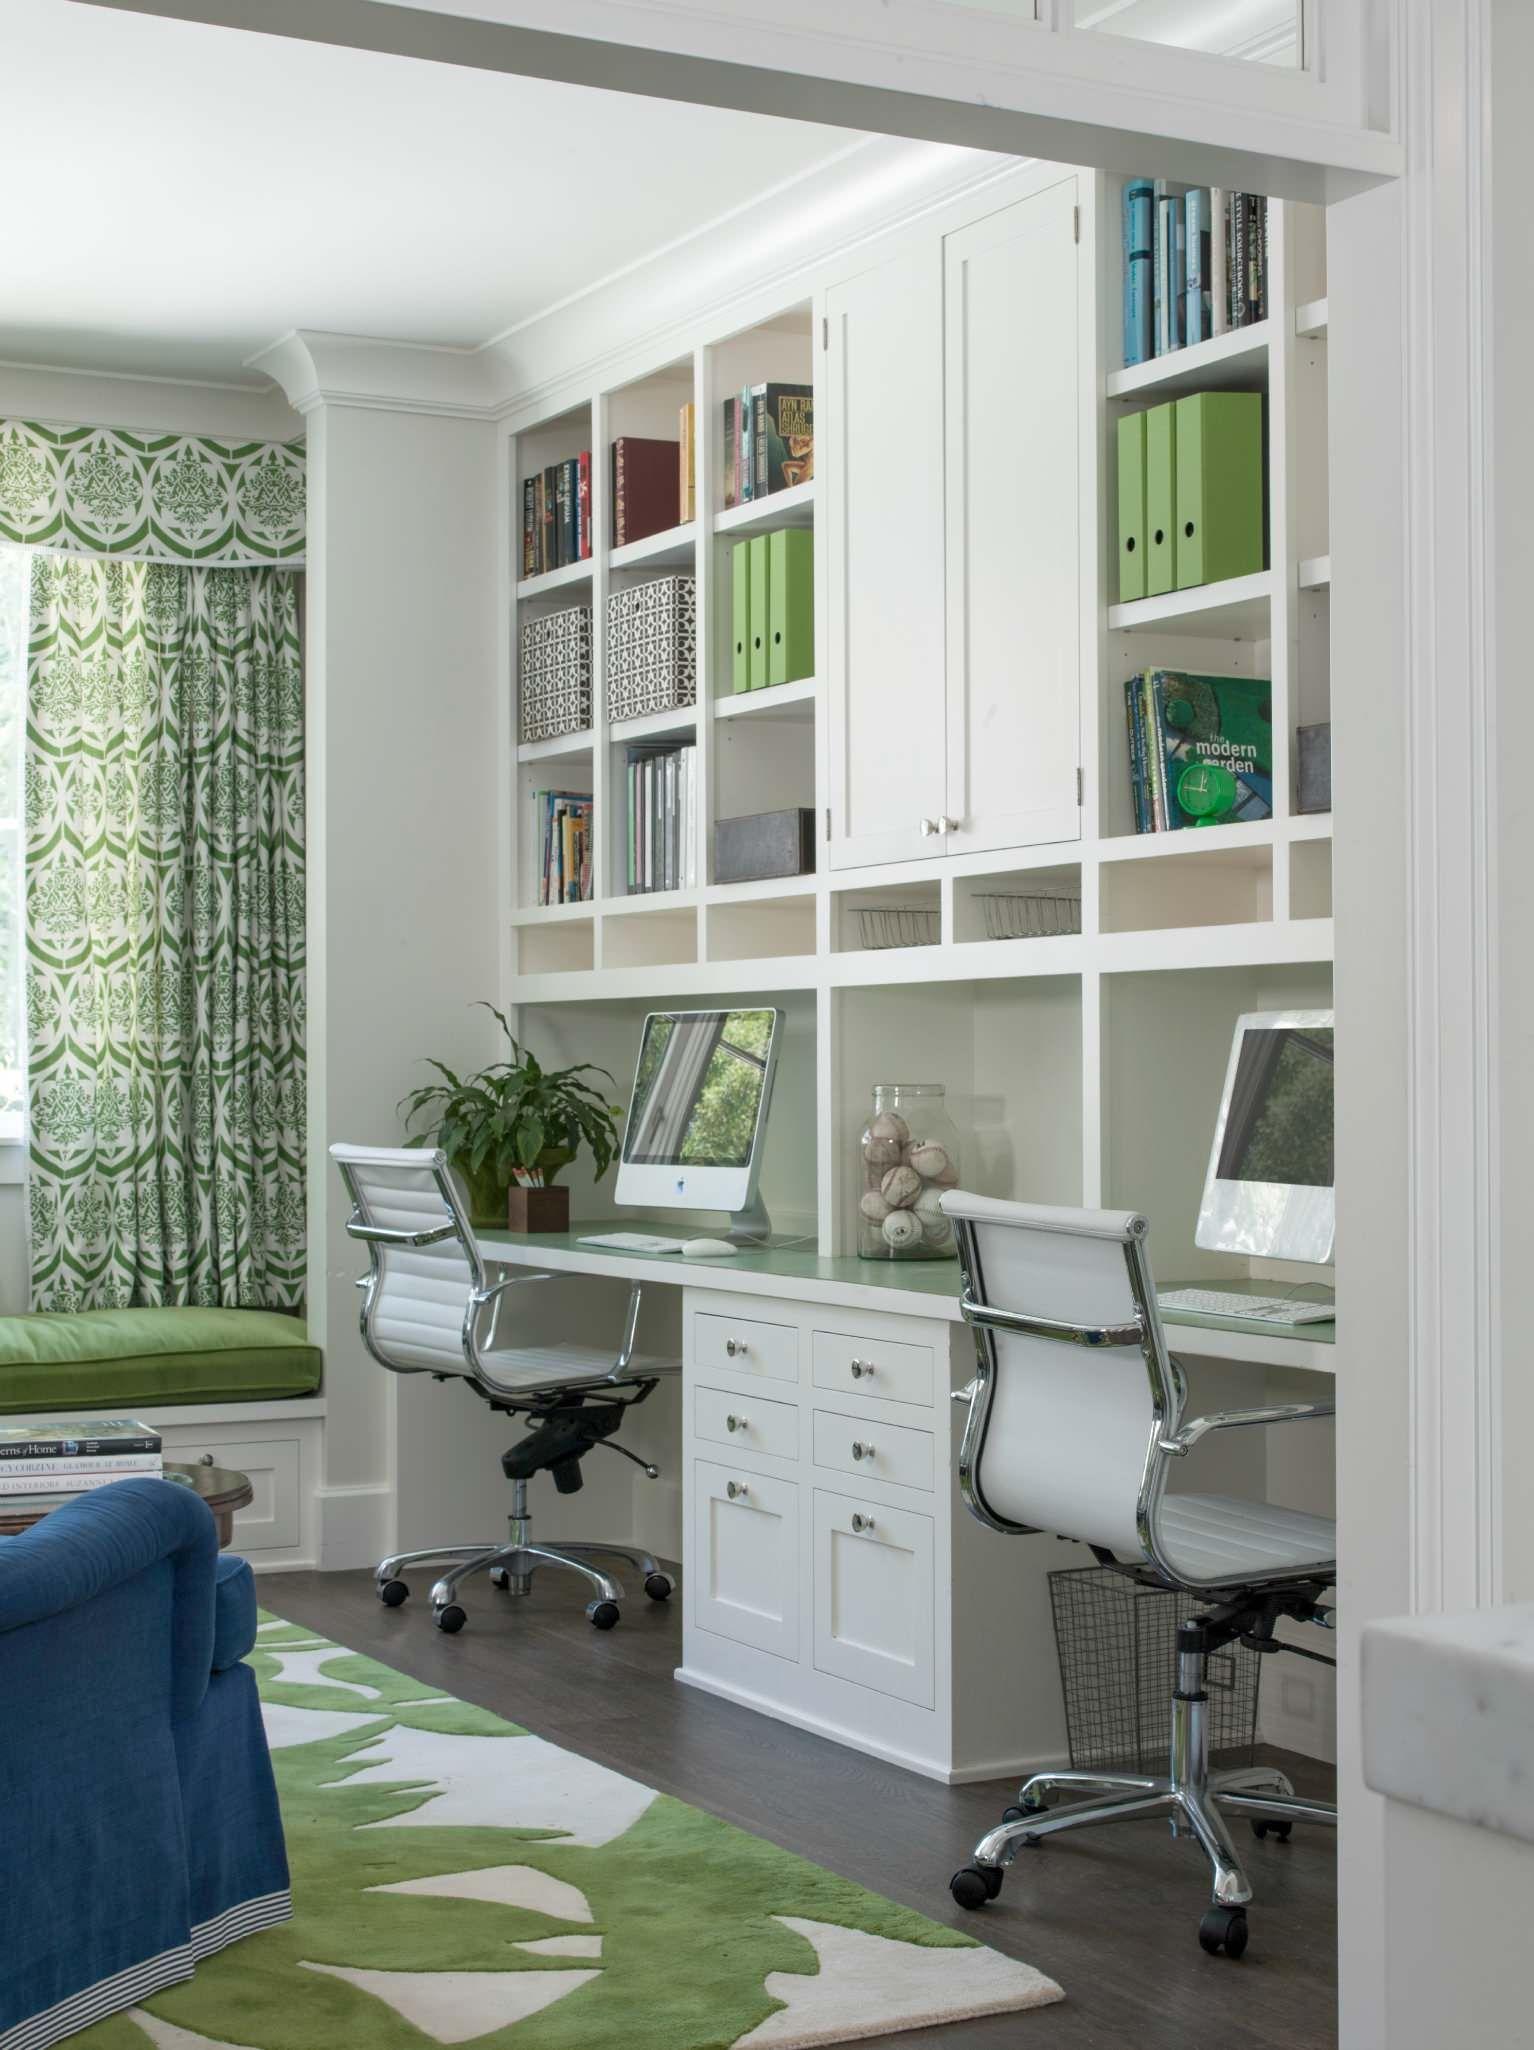 stylish home office design ideas homedesign homedesignideas homedecorideas also homeofficedesign in pinterest rh